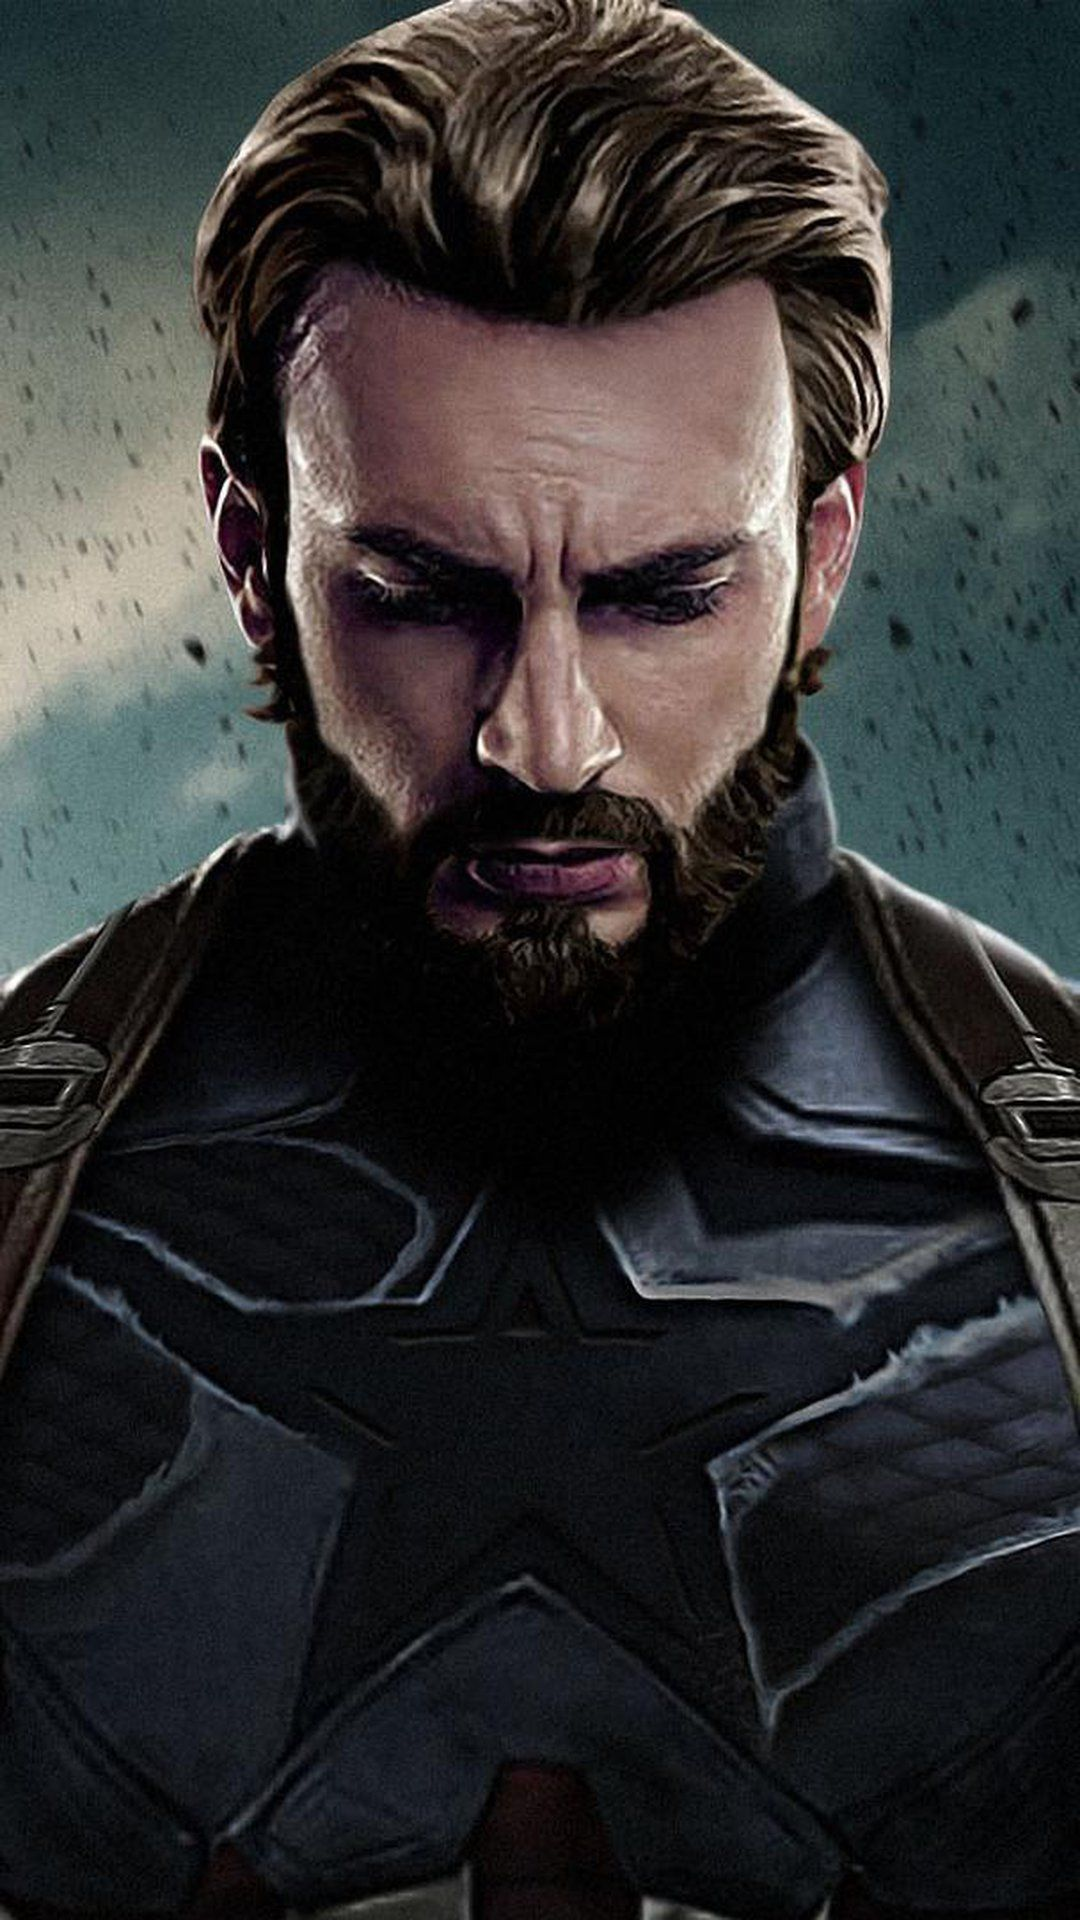 720x1280 Captain America In Avengers Infinity War Moto G X Xperia Z1 Z3 Compact Galaxy S3 Note I Chris Evans Captain America Chris Evans Chris Evans Girlfriend